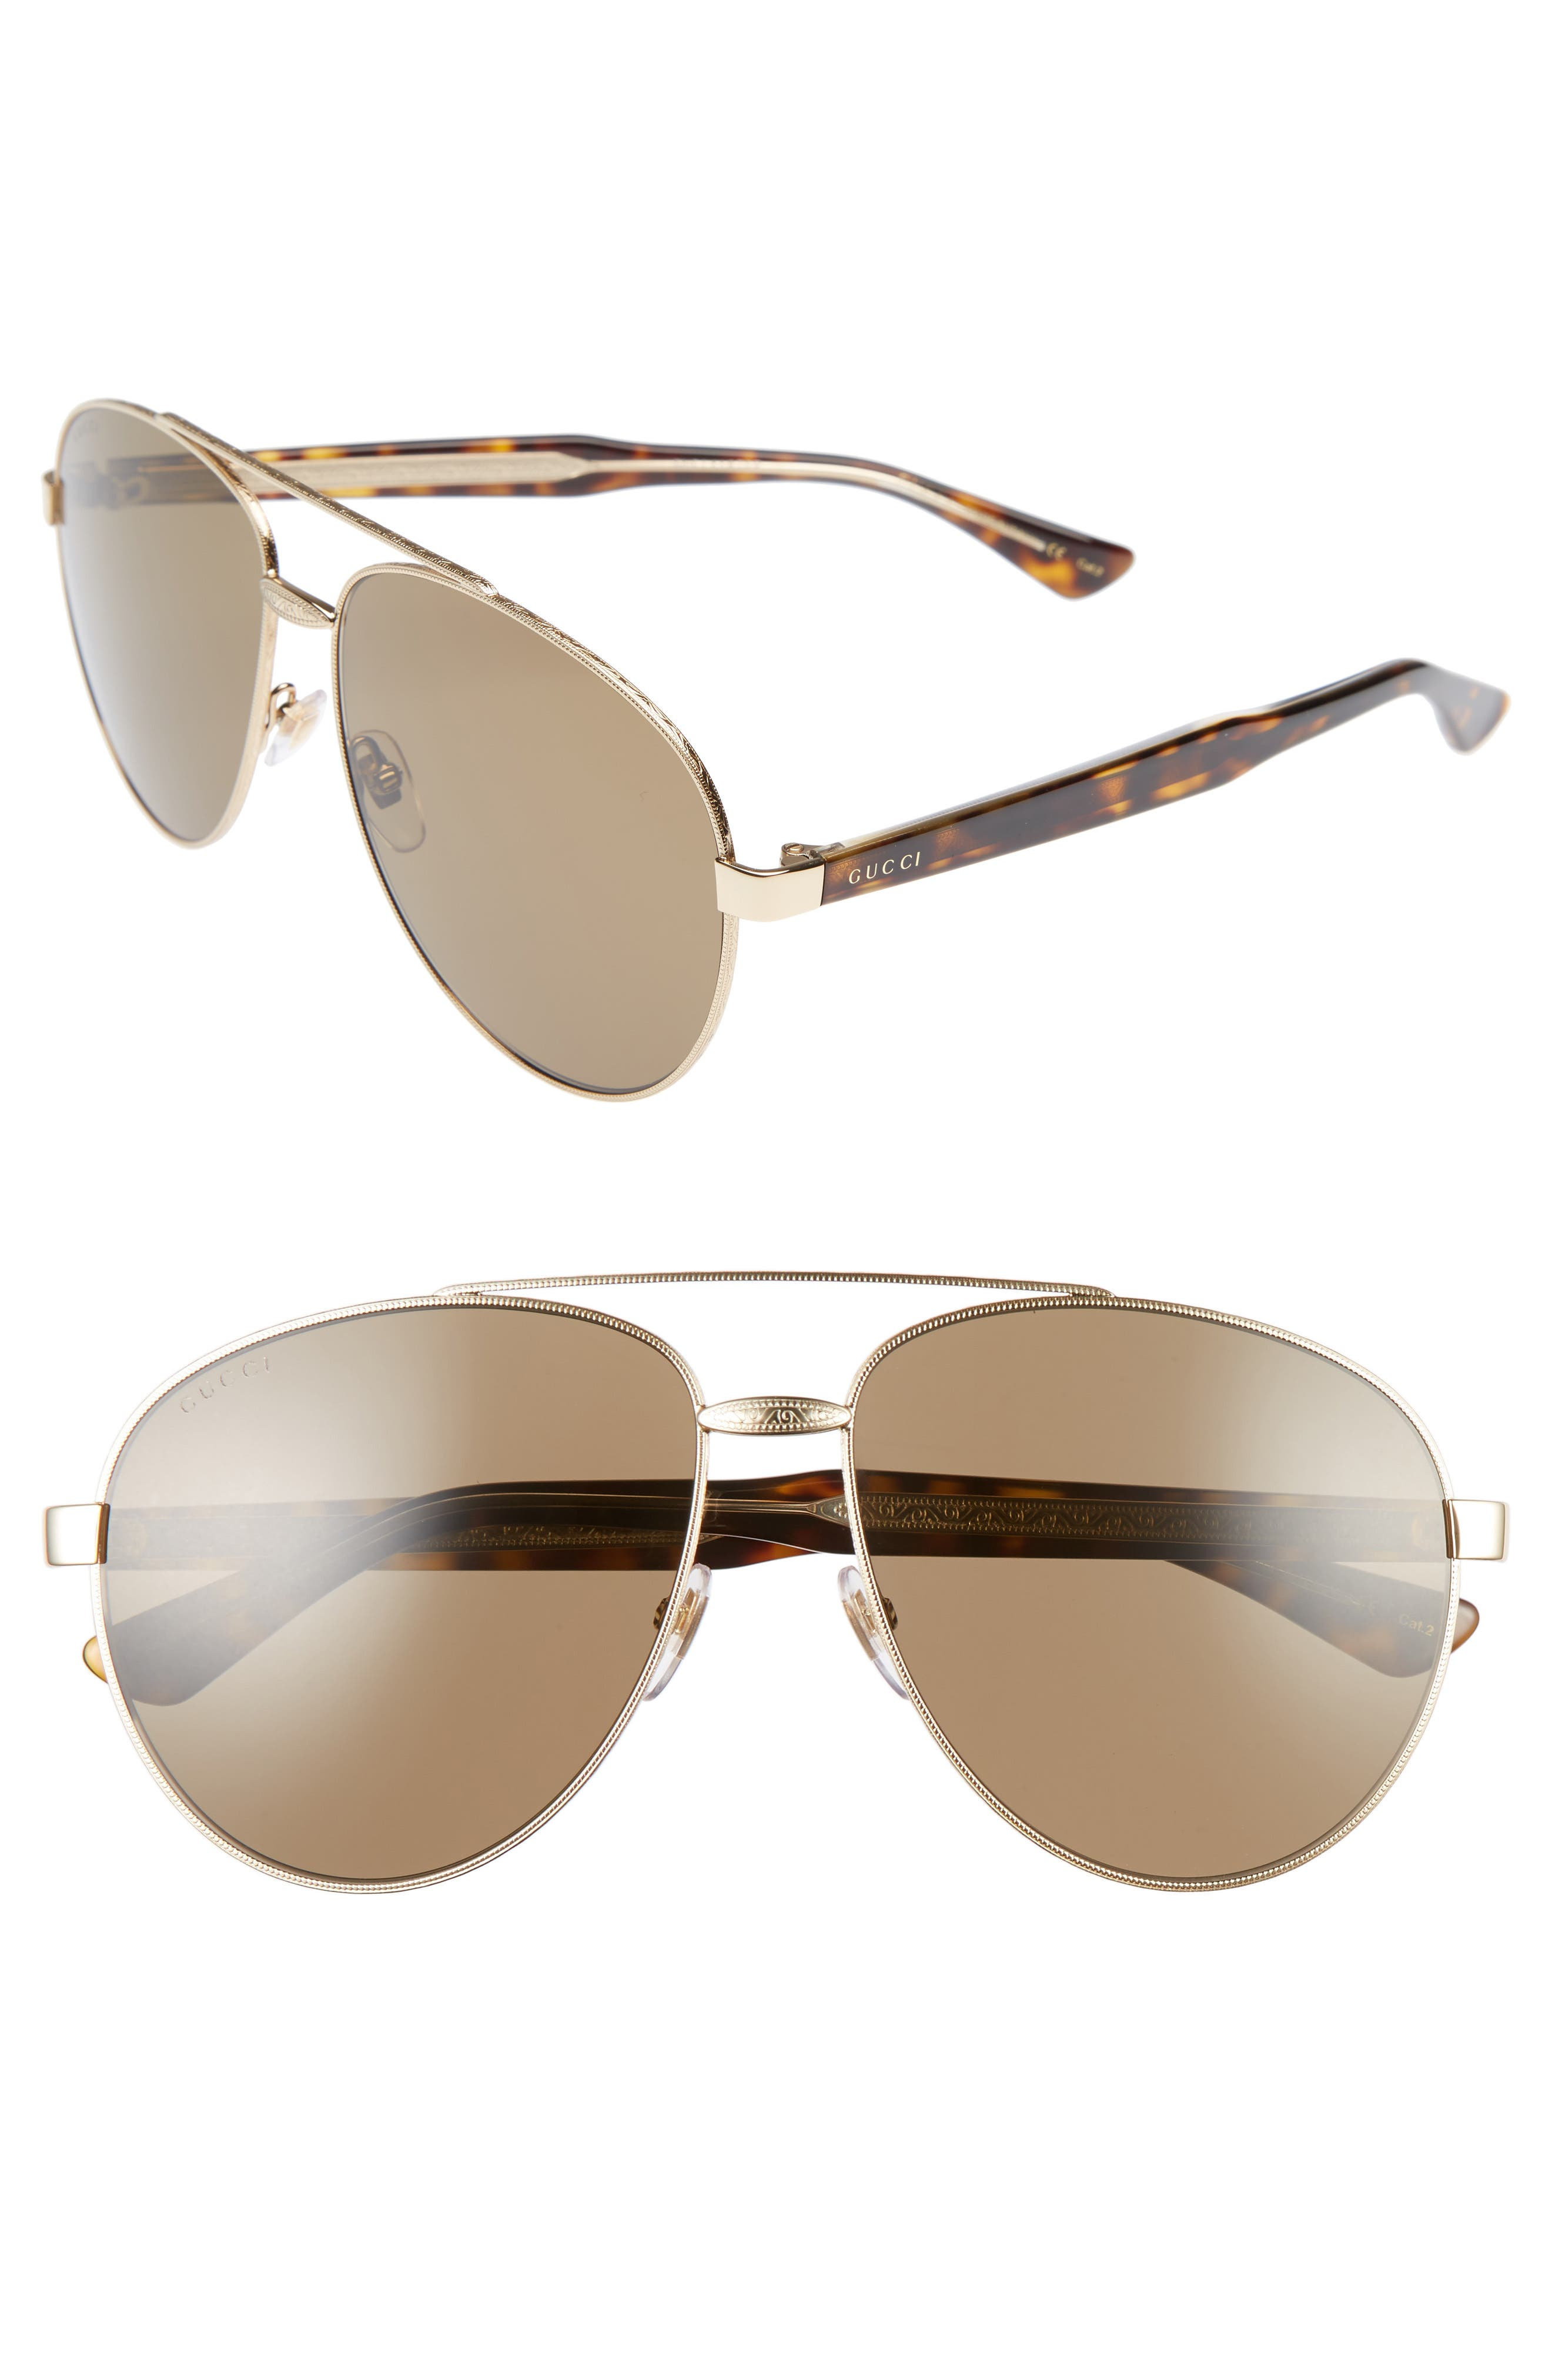 Alternate Image 1 Selected - Gucci 61mm Aviator Sunglasses